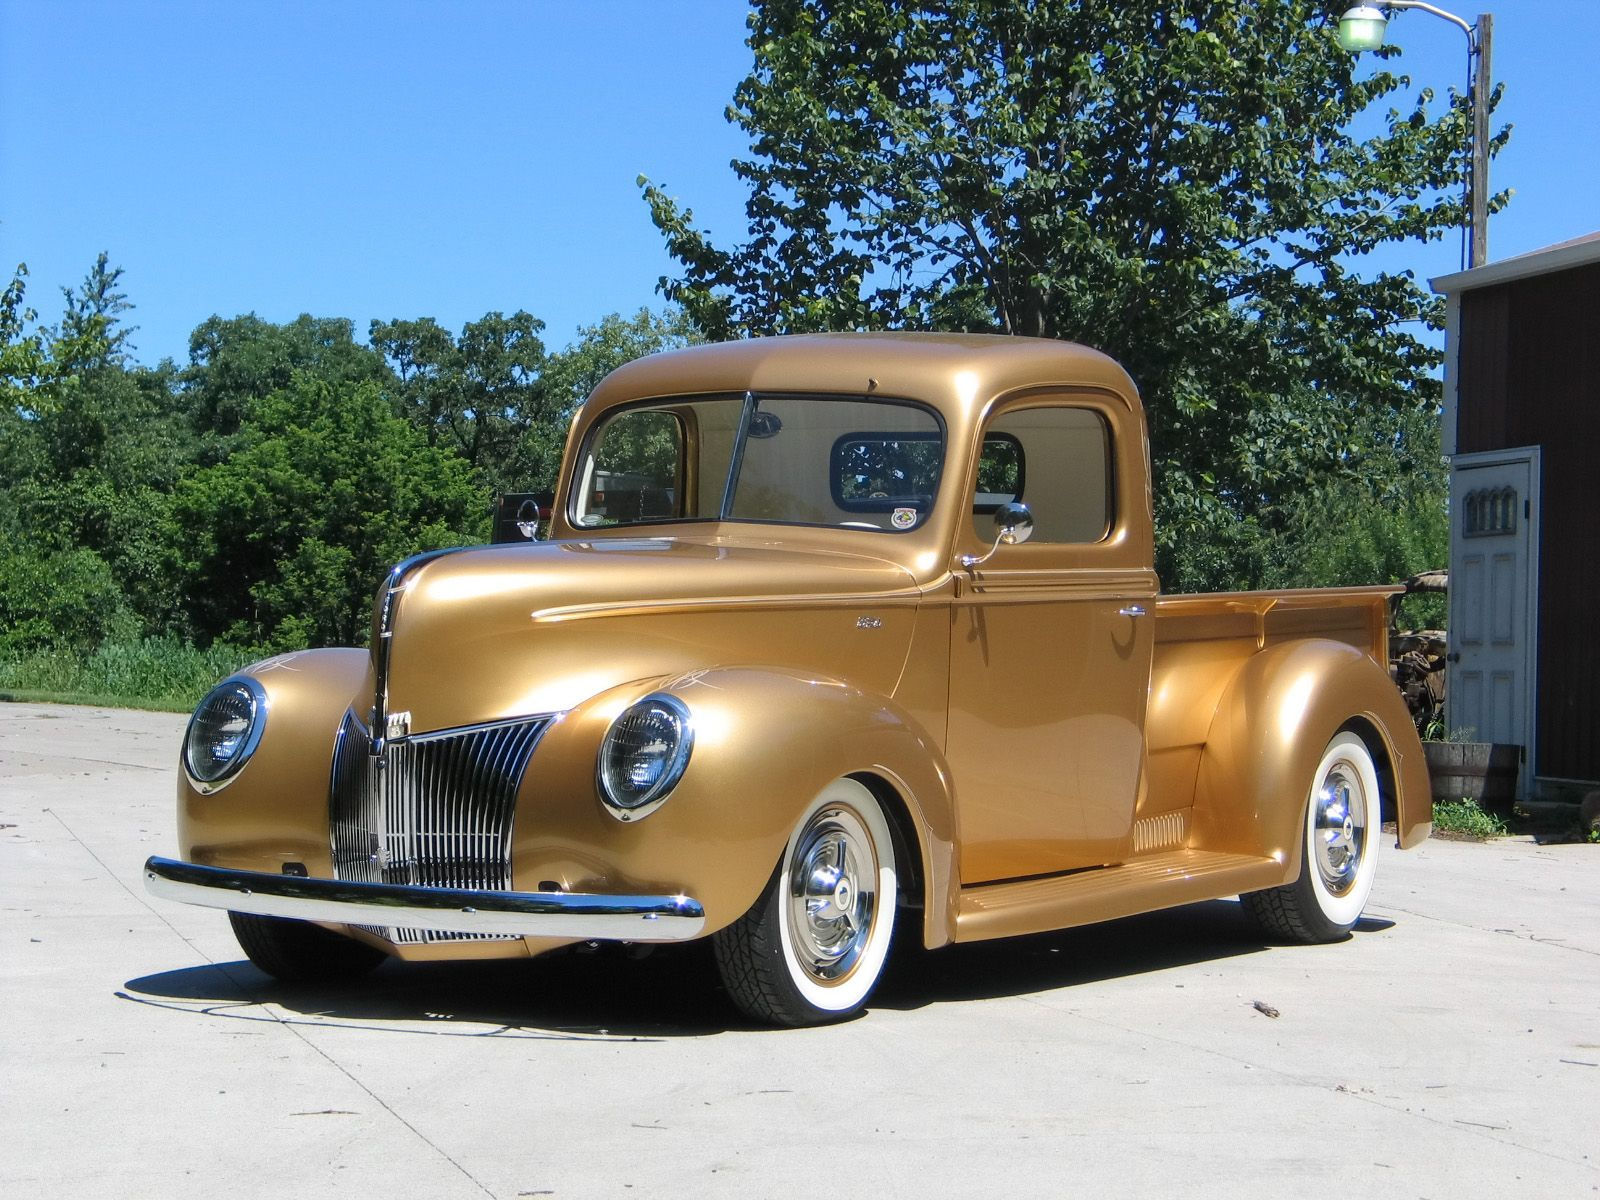 Packard Truck Wallpaper Klasik Arabalar Klasik Arabalar